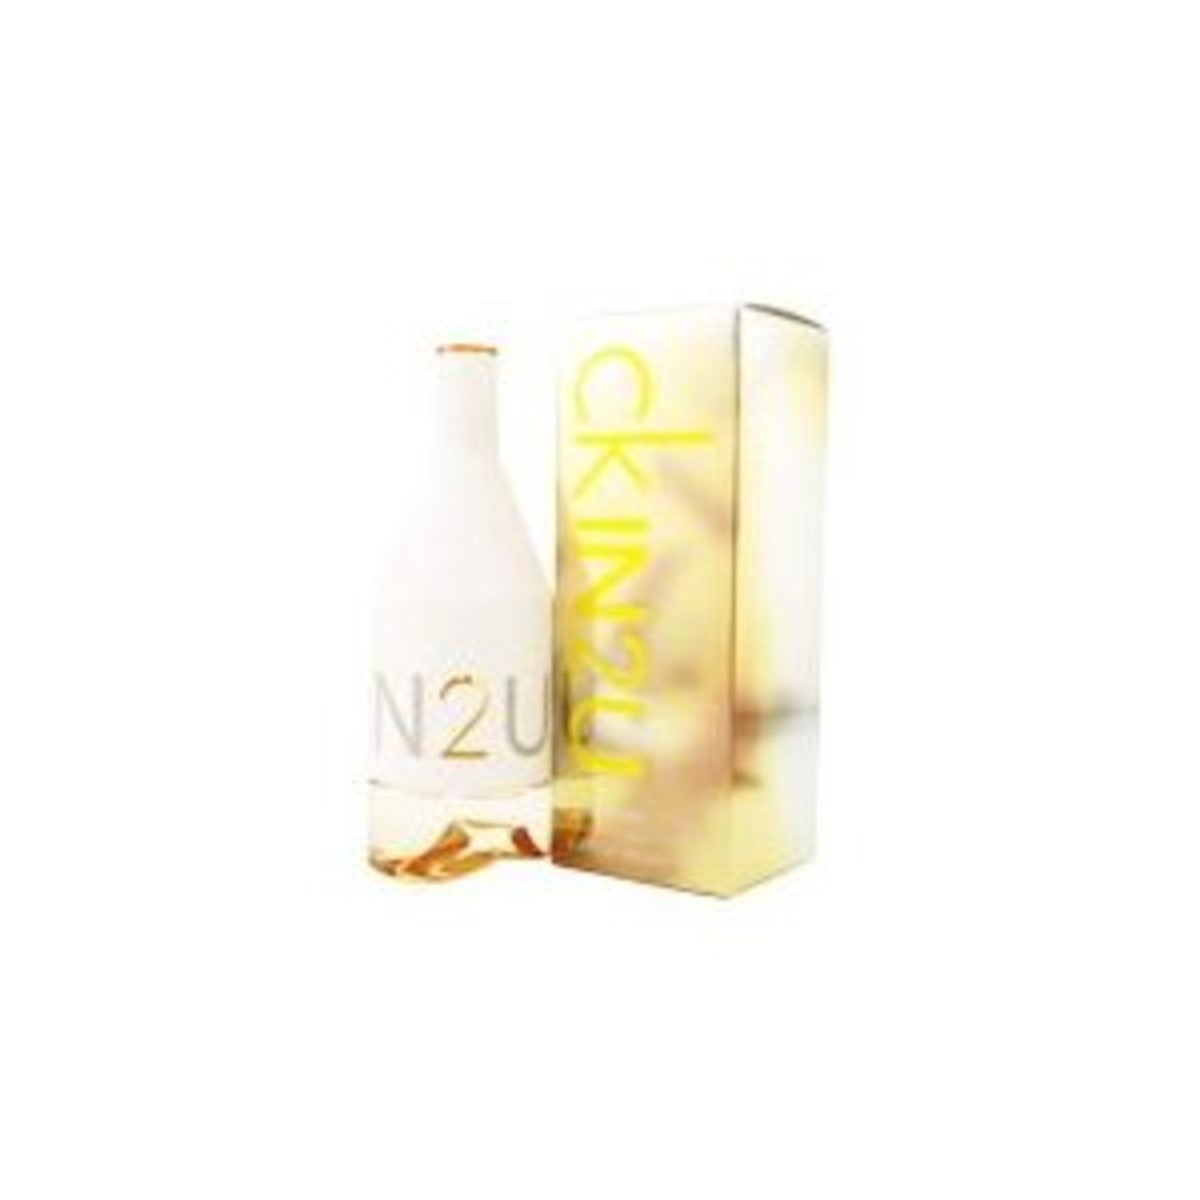 CK IN2U Perfume for Women